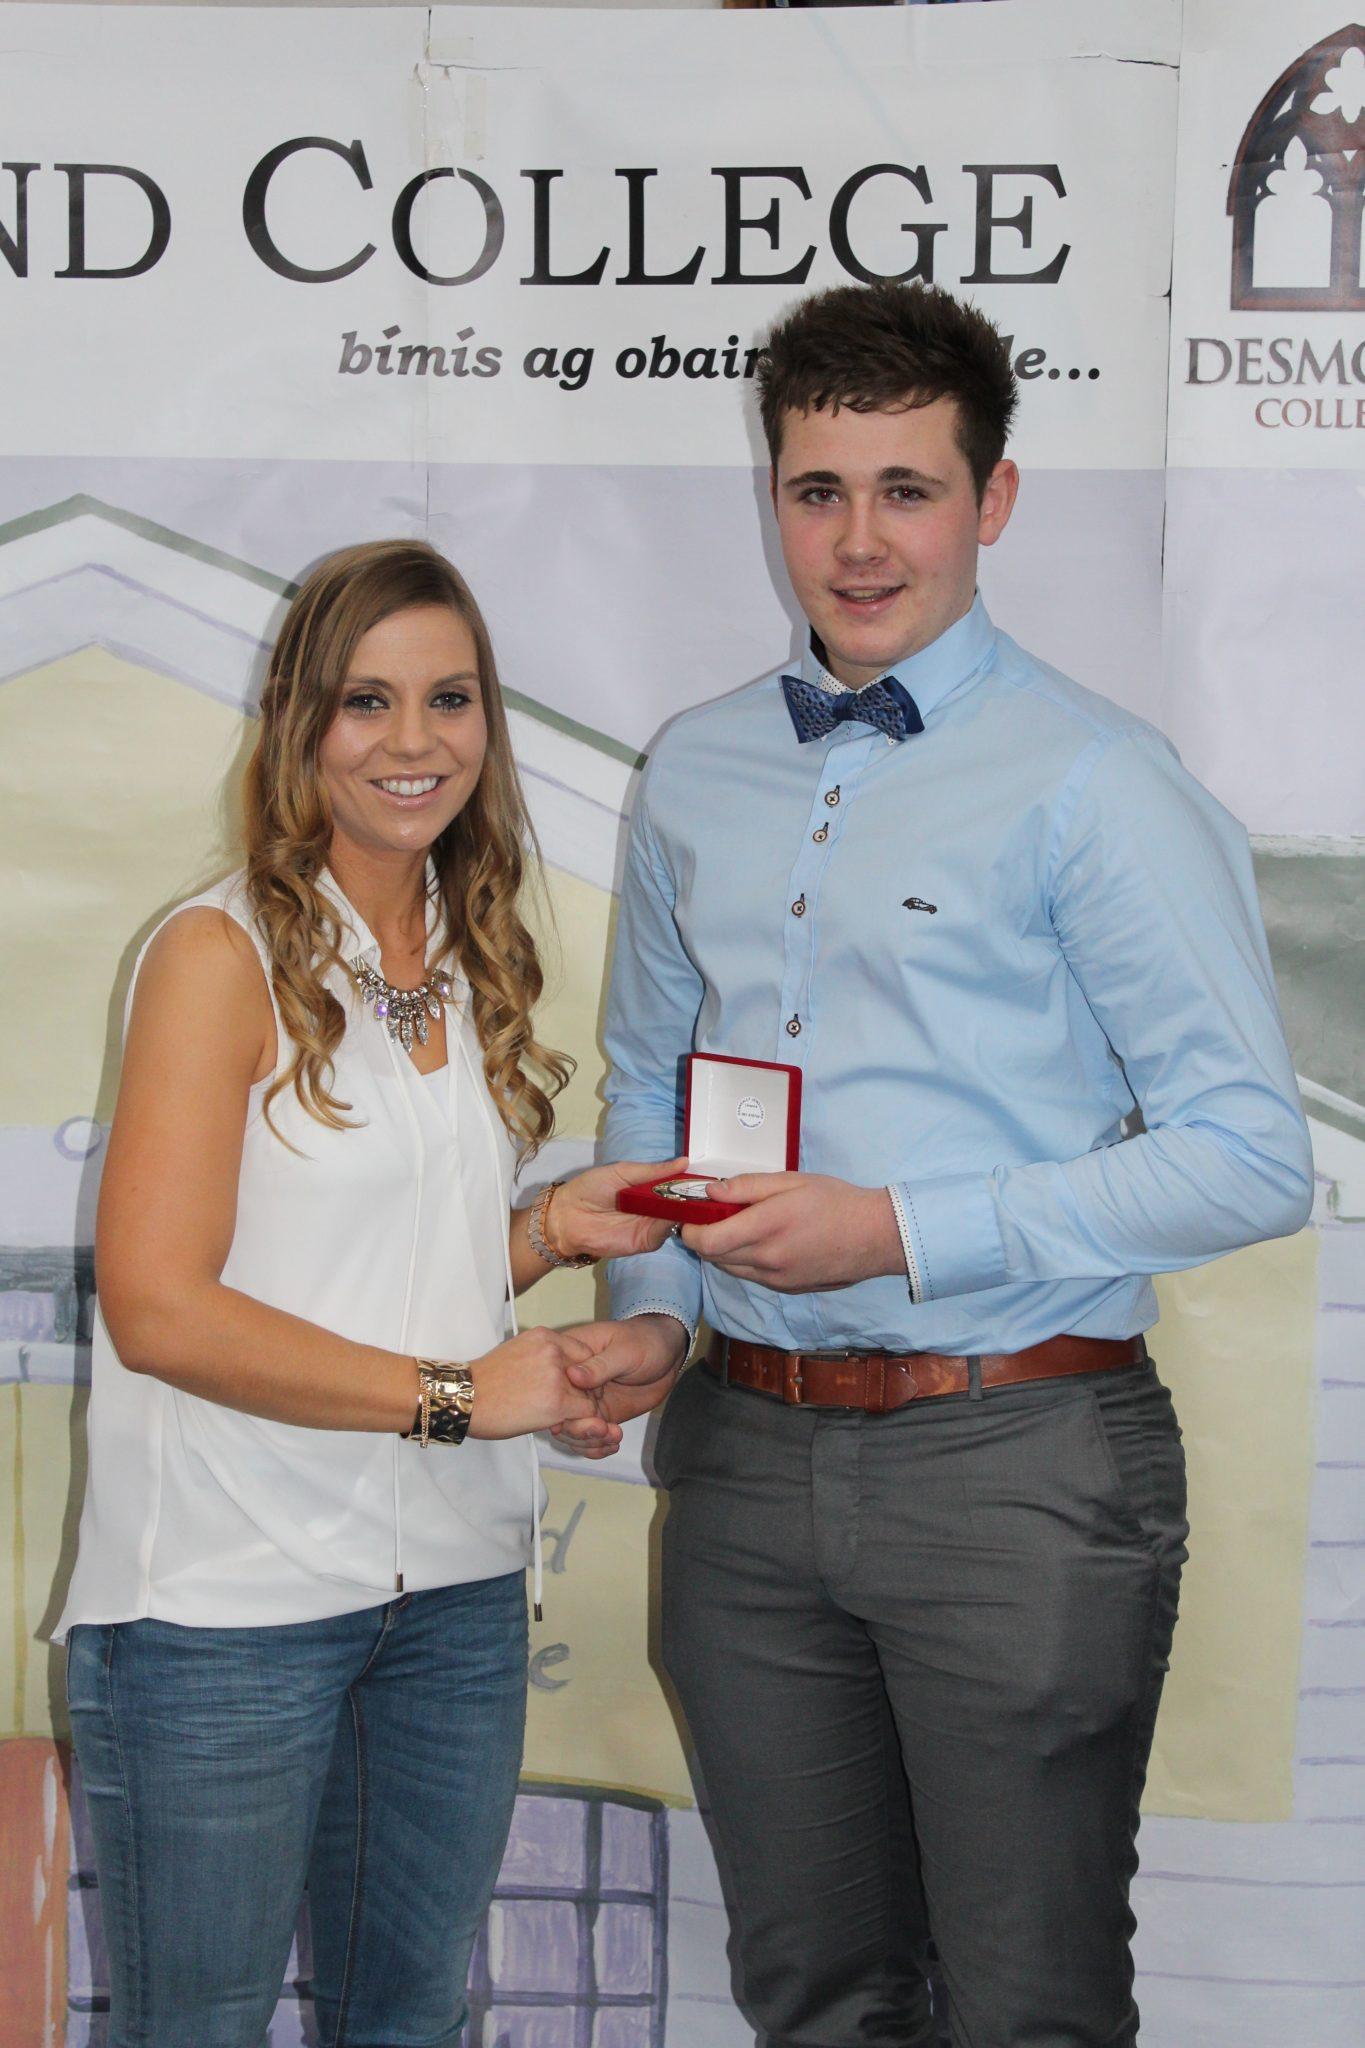 Desmond College Leaving Certificate Graduation 2015 : Sports Awards : Reus Lambadarios with Ms Corkery